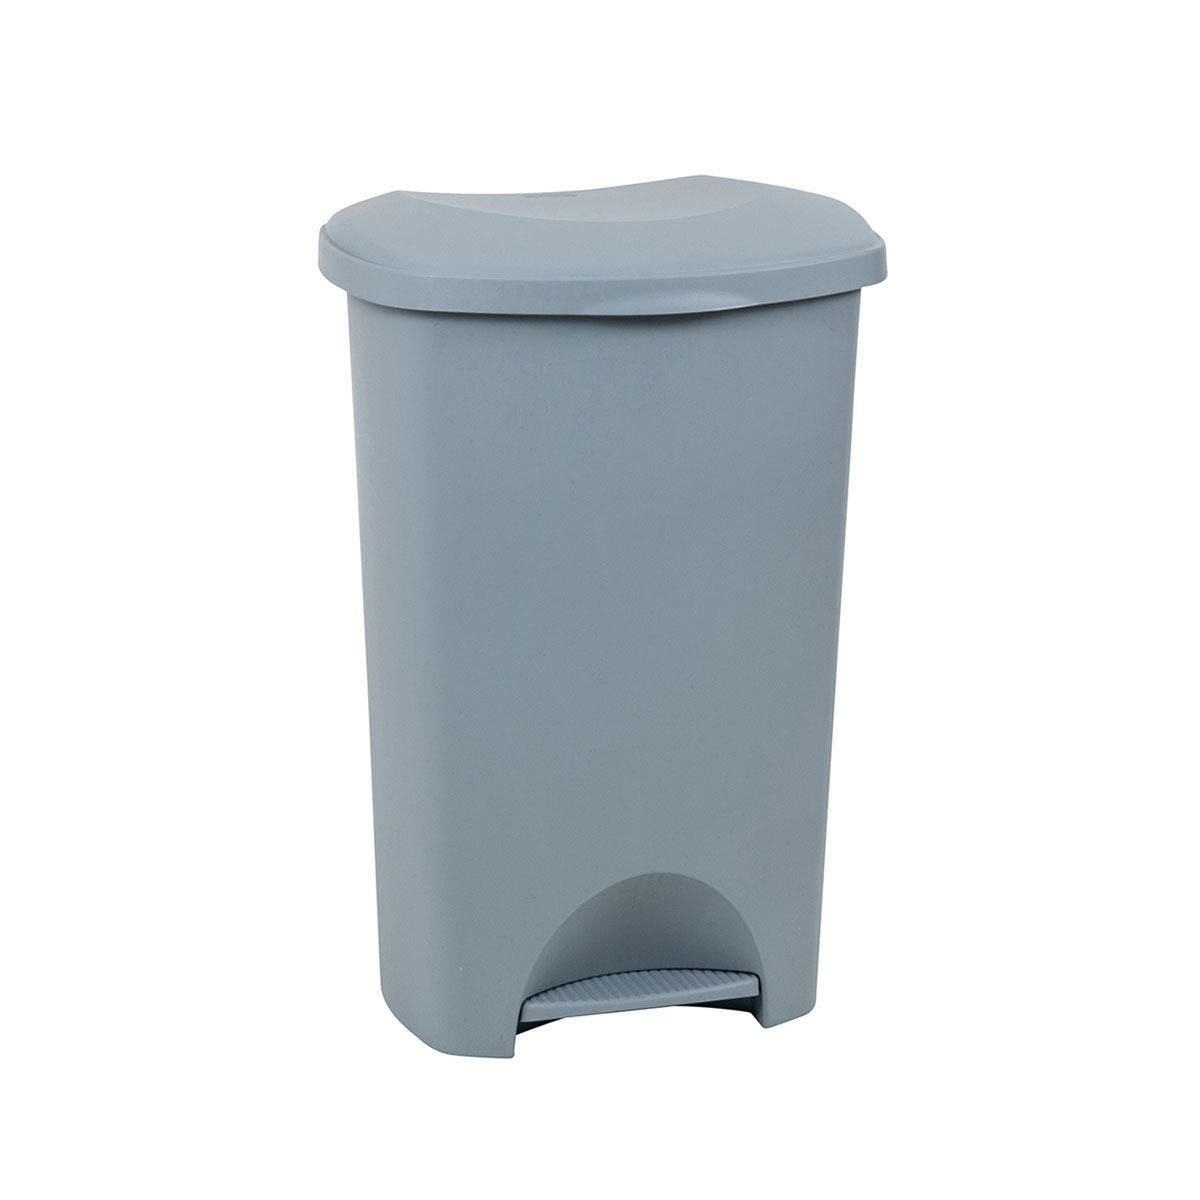 Addis 50L Recycled Pedal Bin - Grey